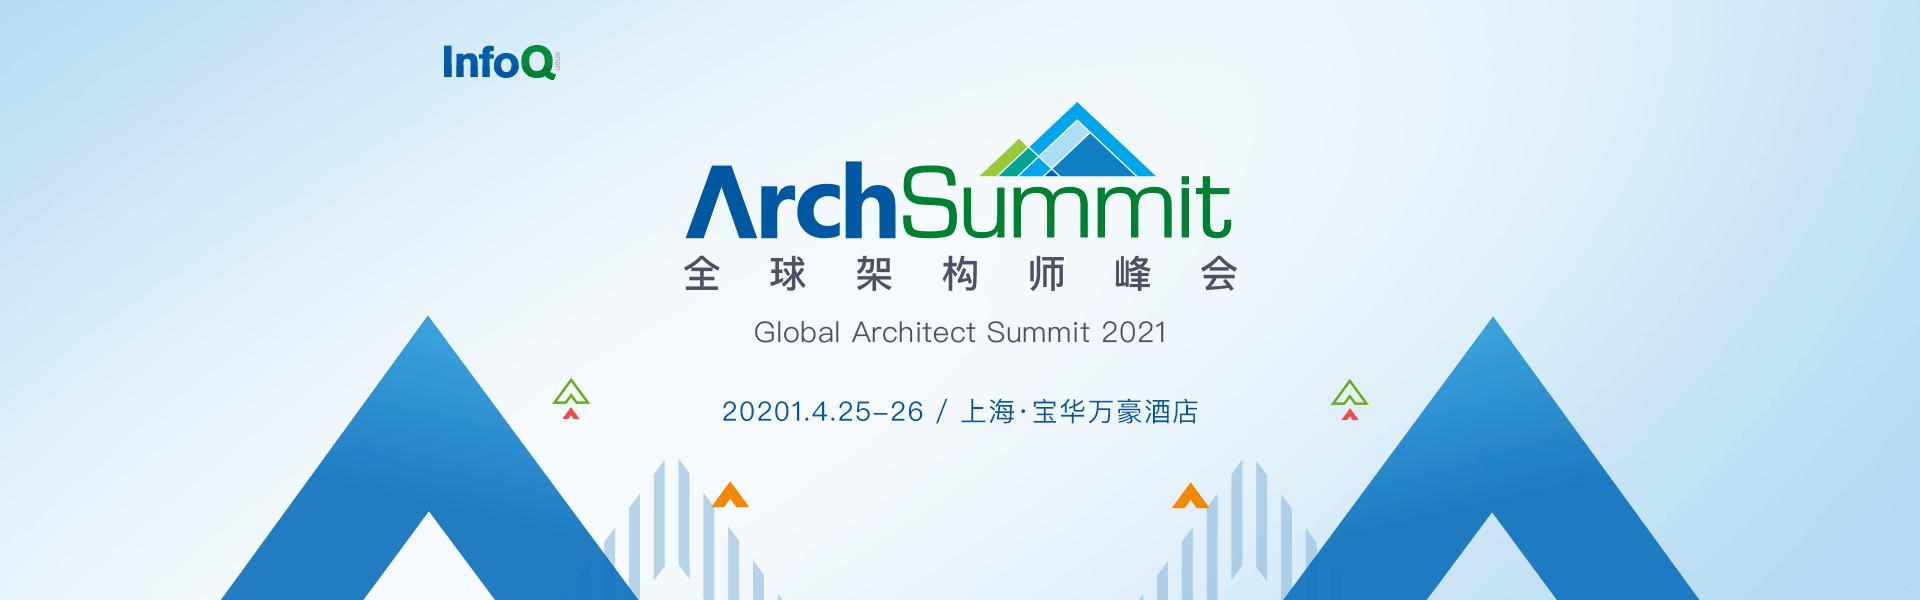 ArchSummit上海2021|全球架构师峰会